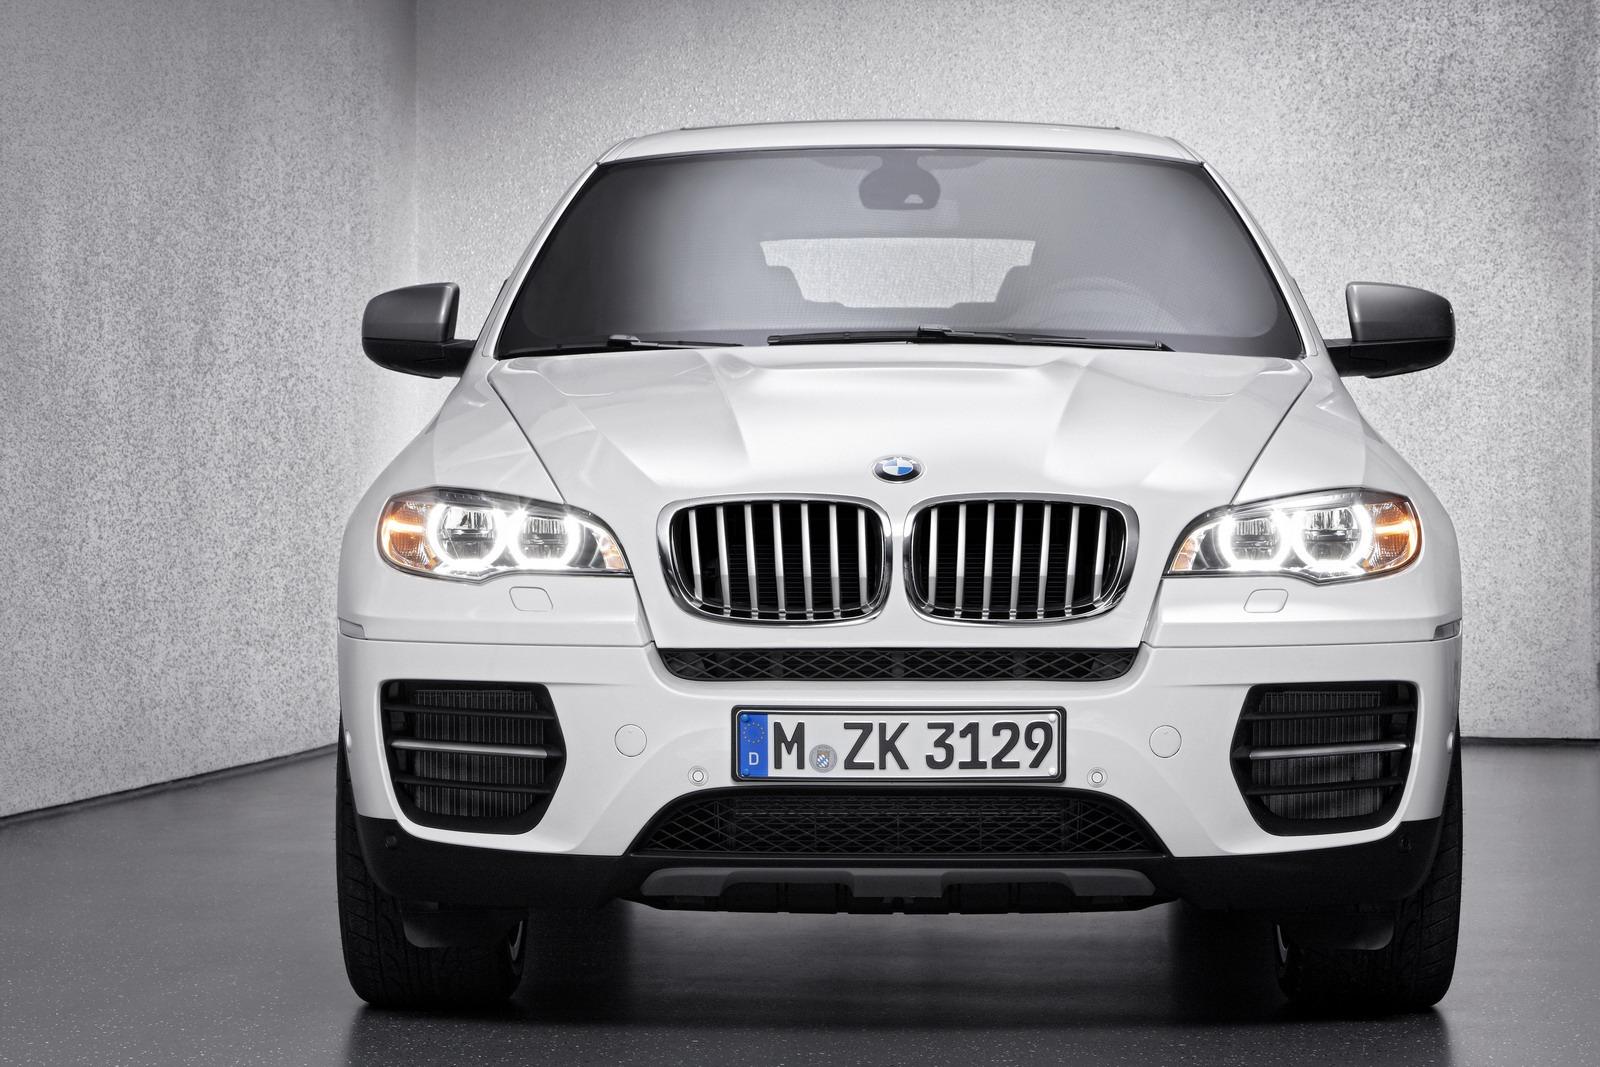 2013 Bmw X6 M50d Equipment List Revealed Autoevolution